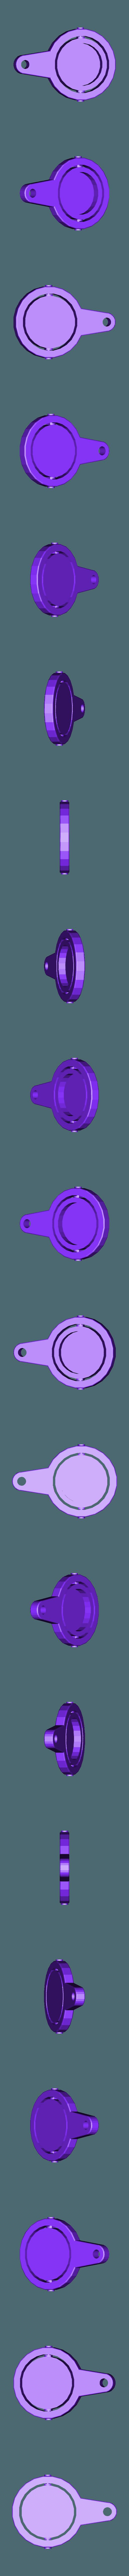 LLavero_Sonrisa_Giratorio.stl Télécharger fichier STL gratuit LLAVERO GIRATORIO SONRISA • Design pour impression 3D, celtarra12